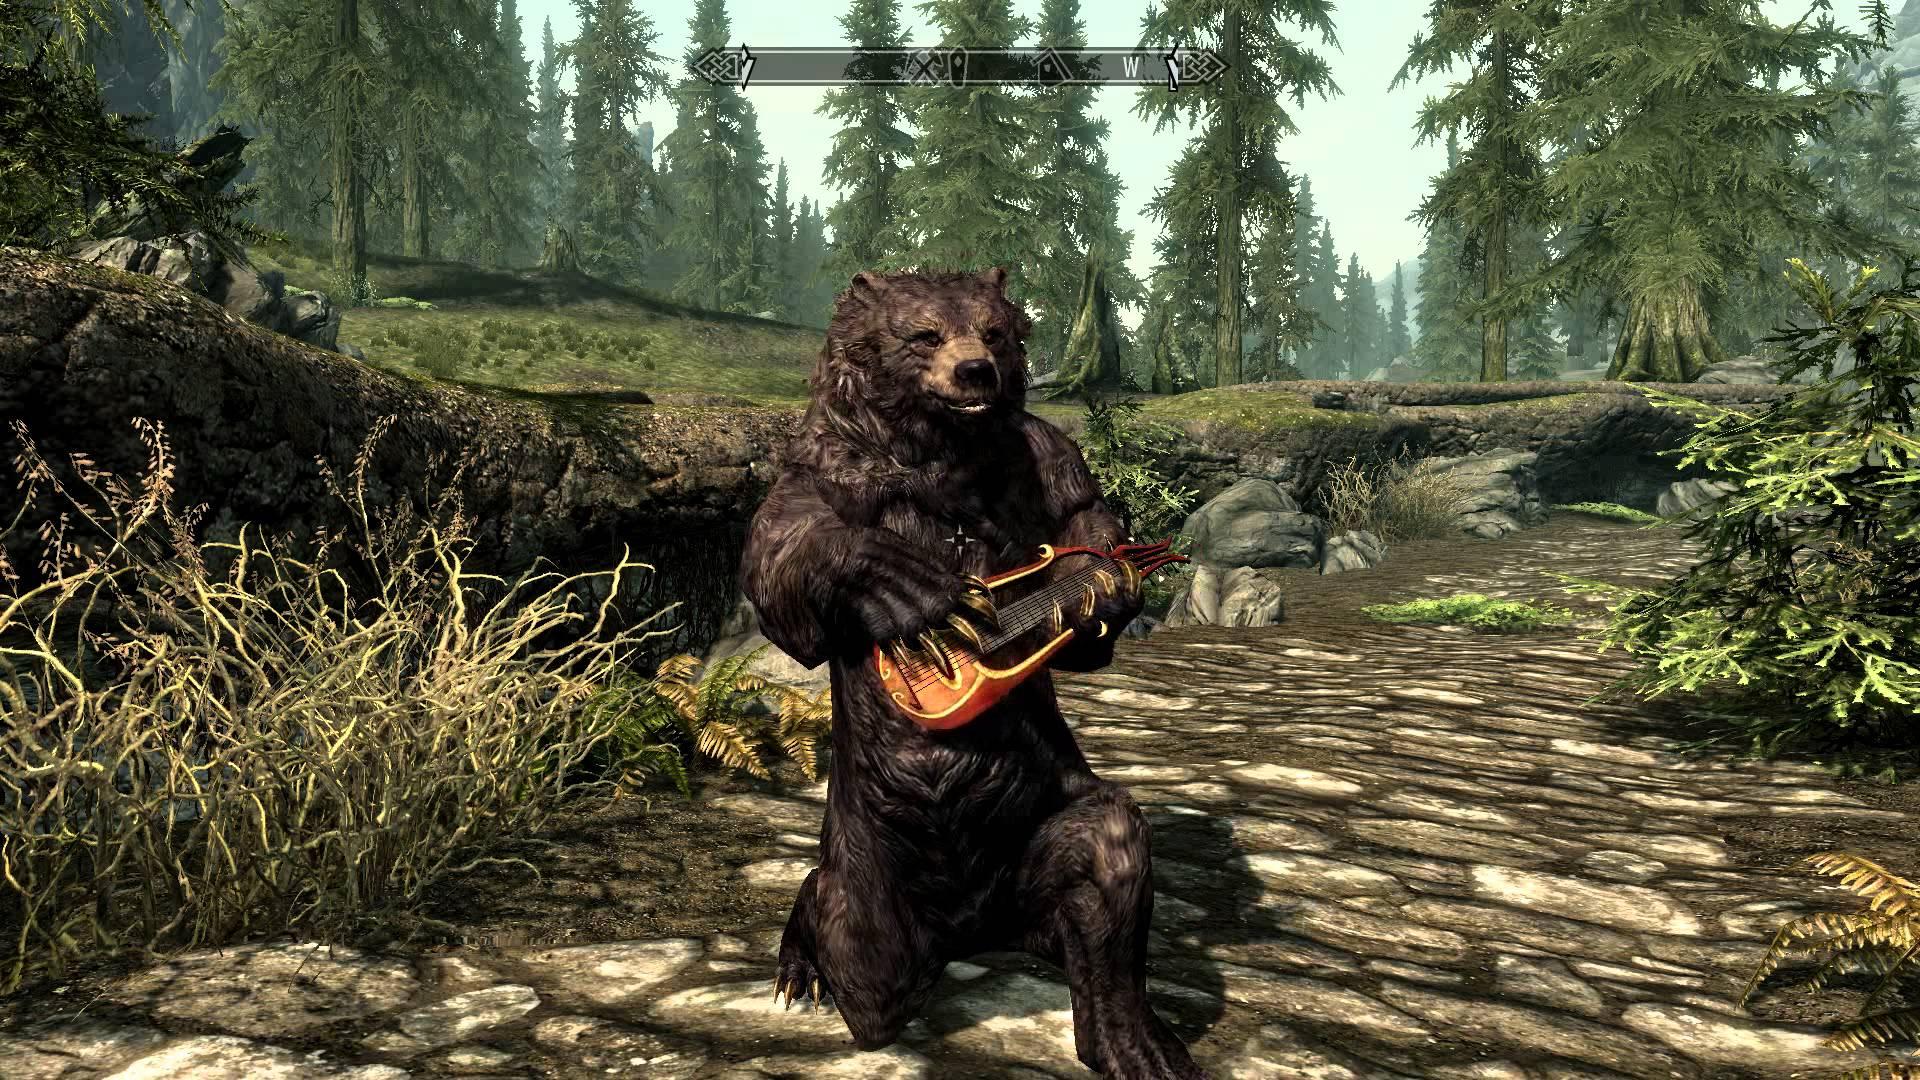 skyrim bear musician